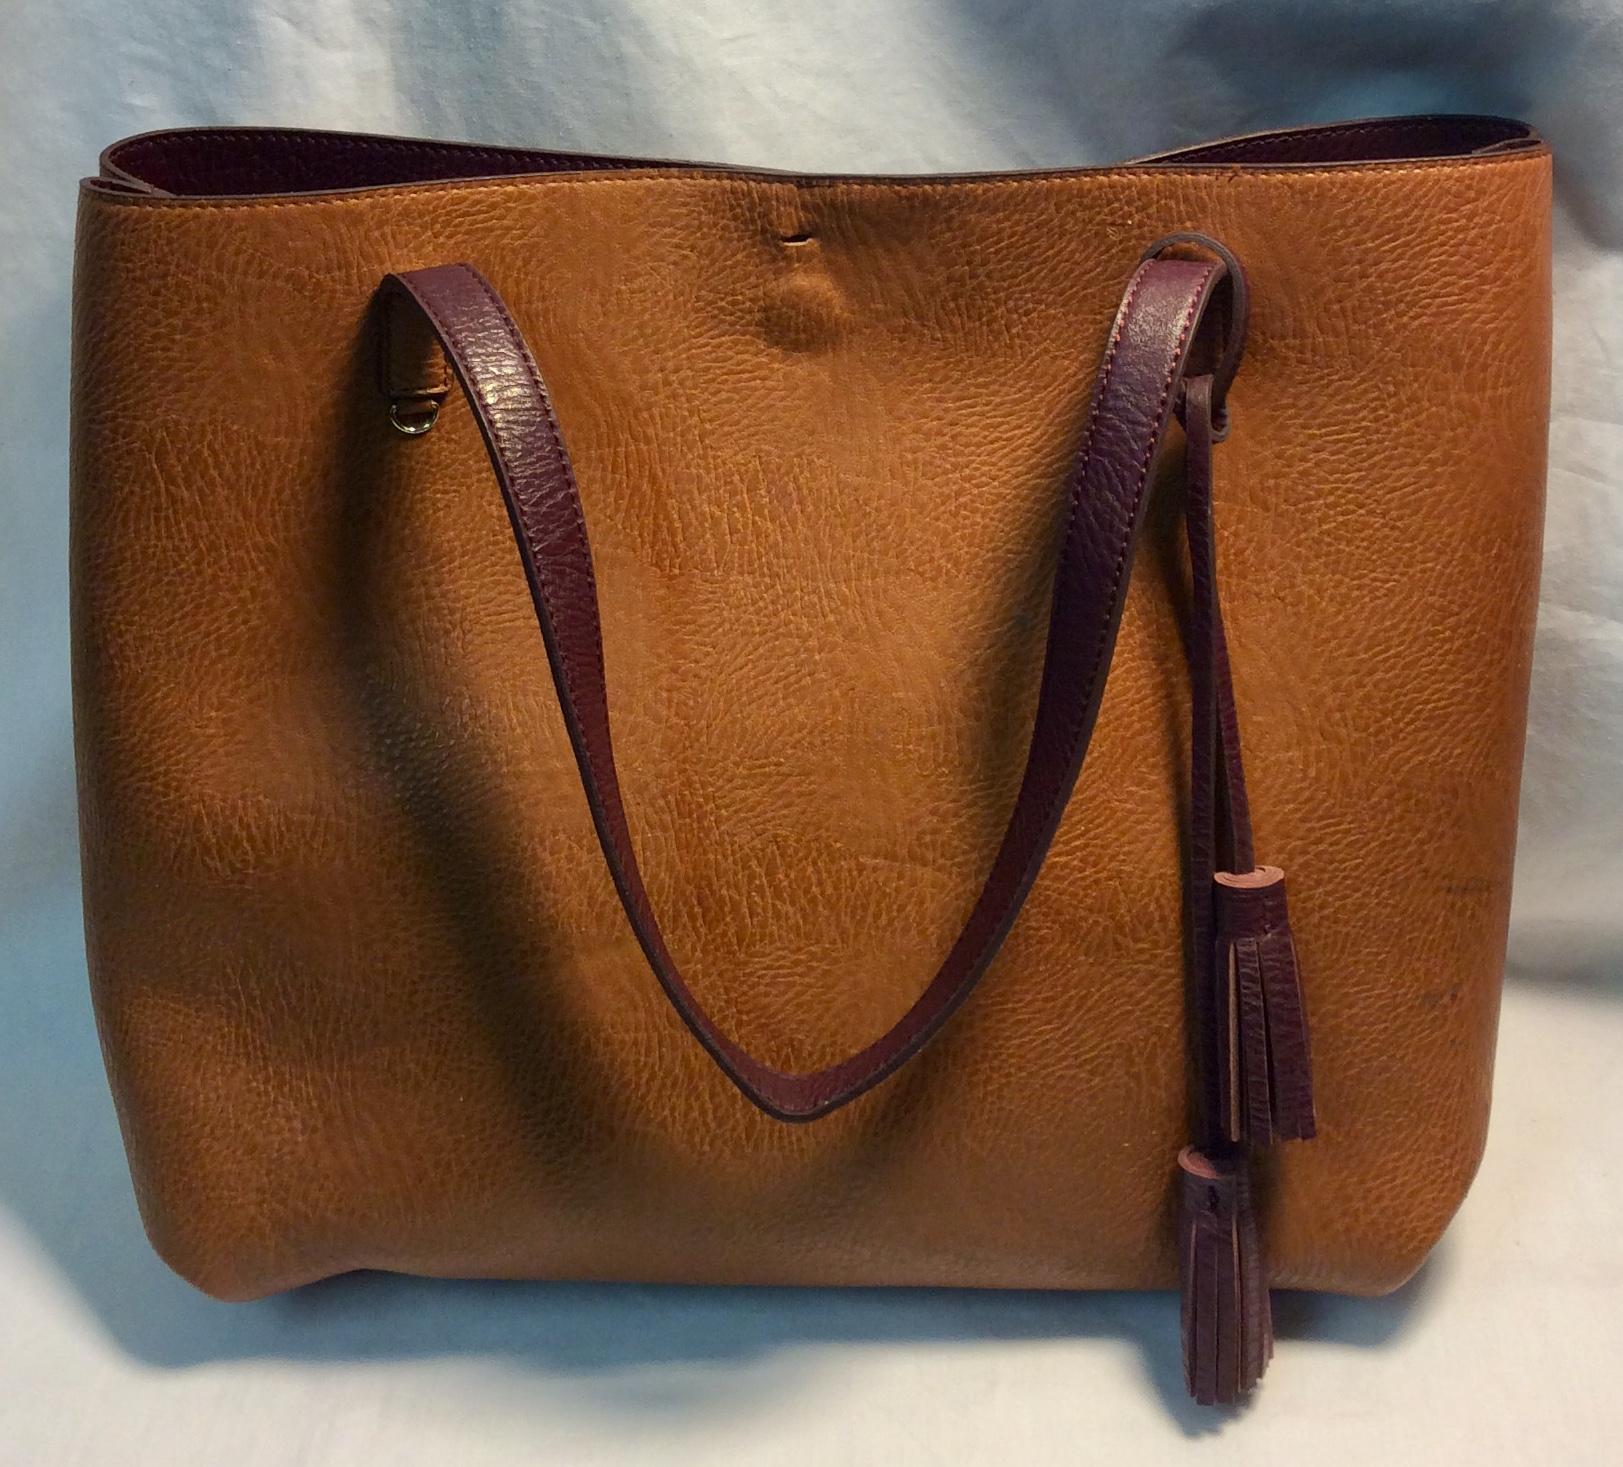 Brown leather bag, maroon interior